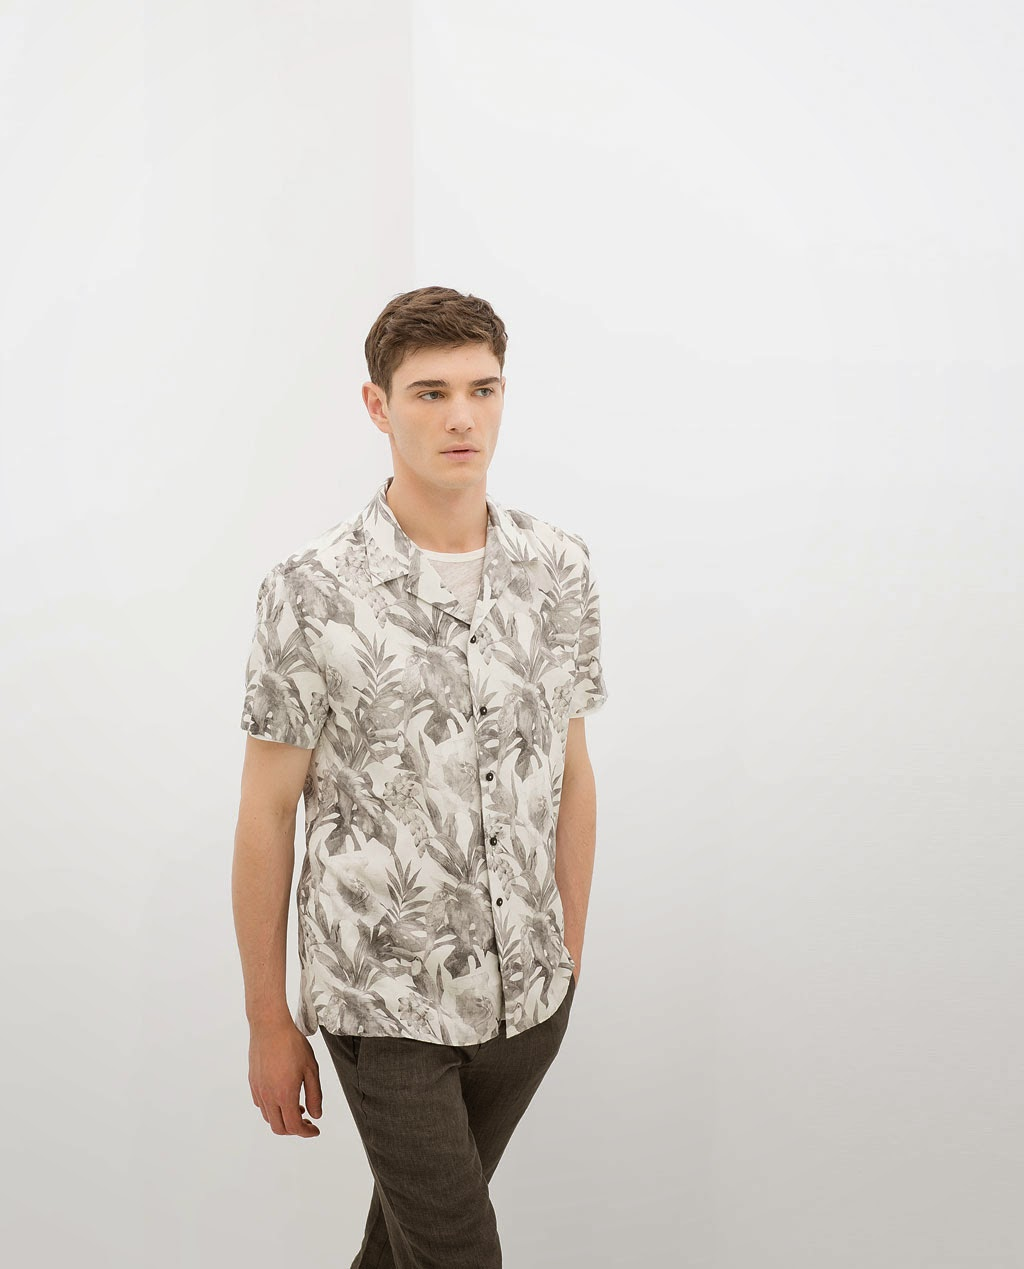 Oliver Cheshire Zara shirt